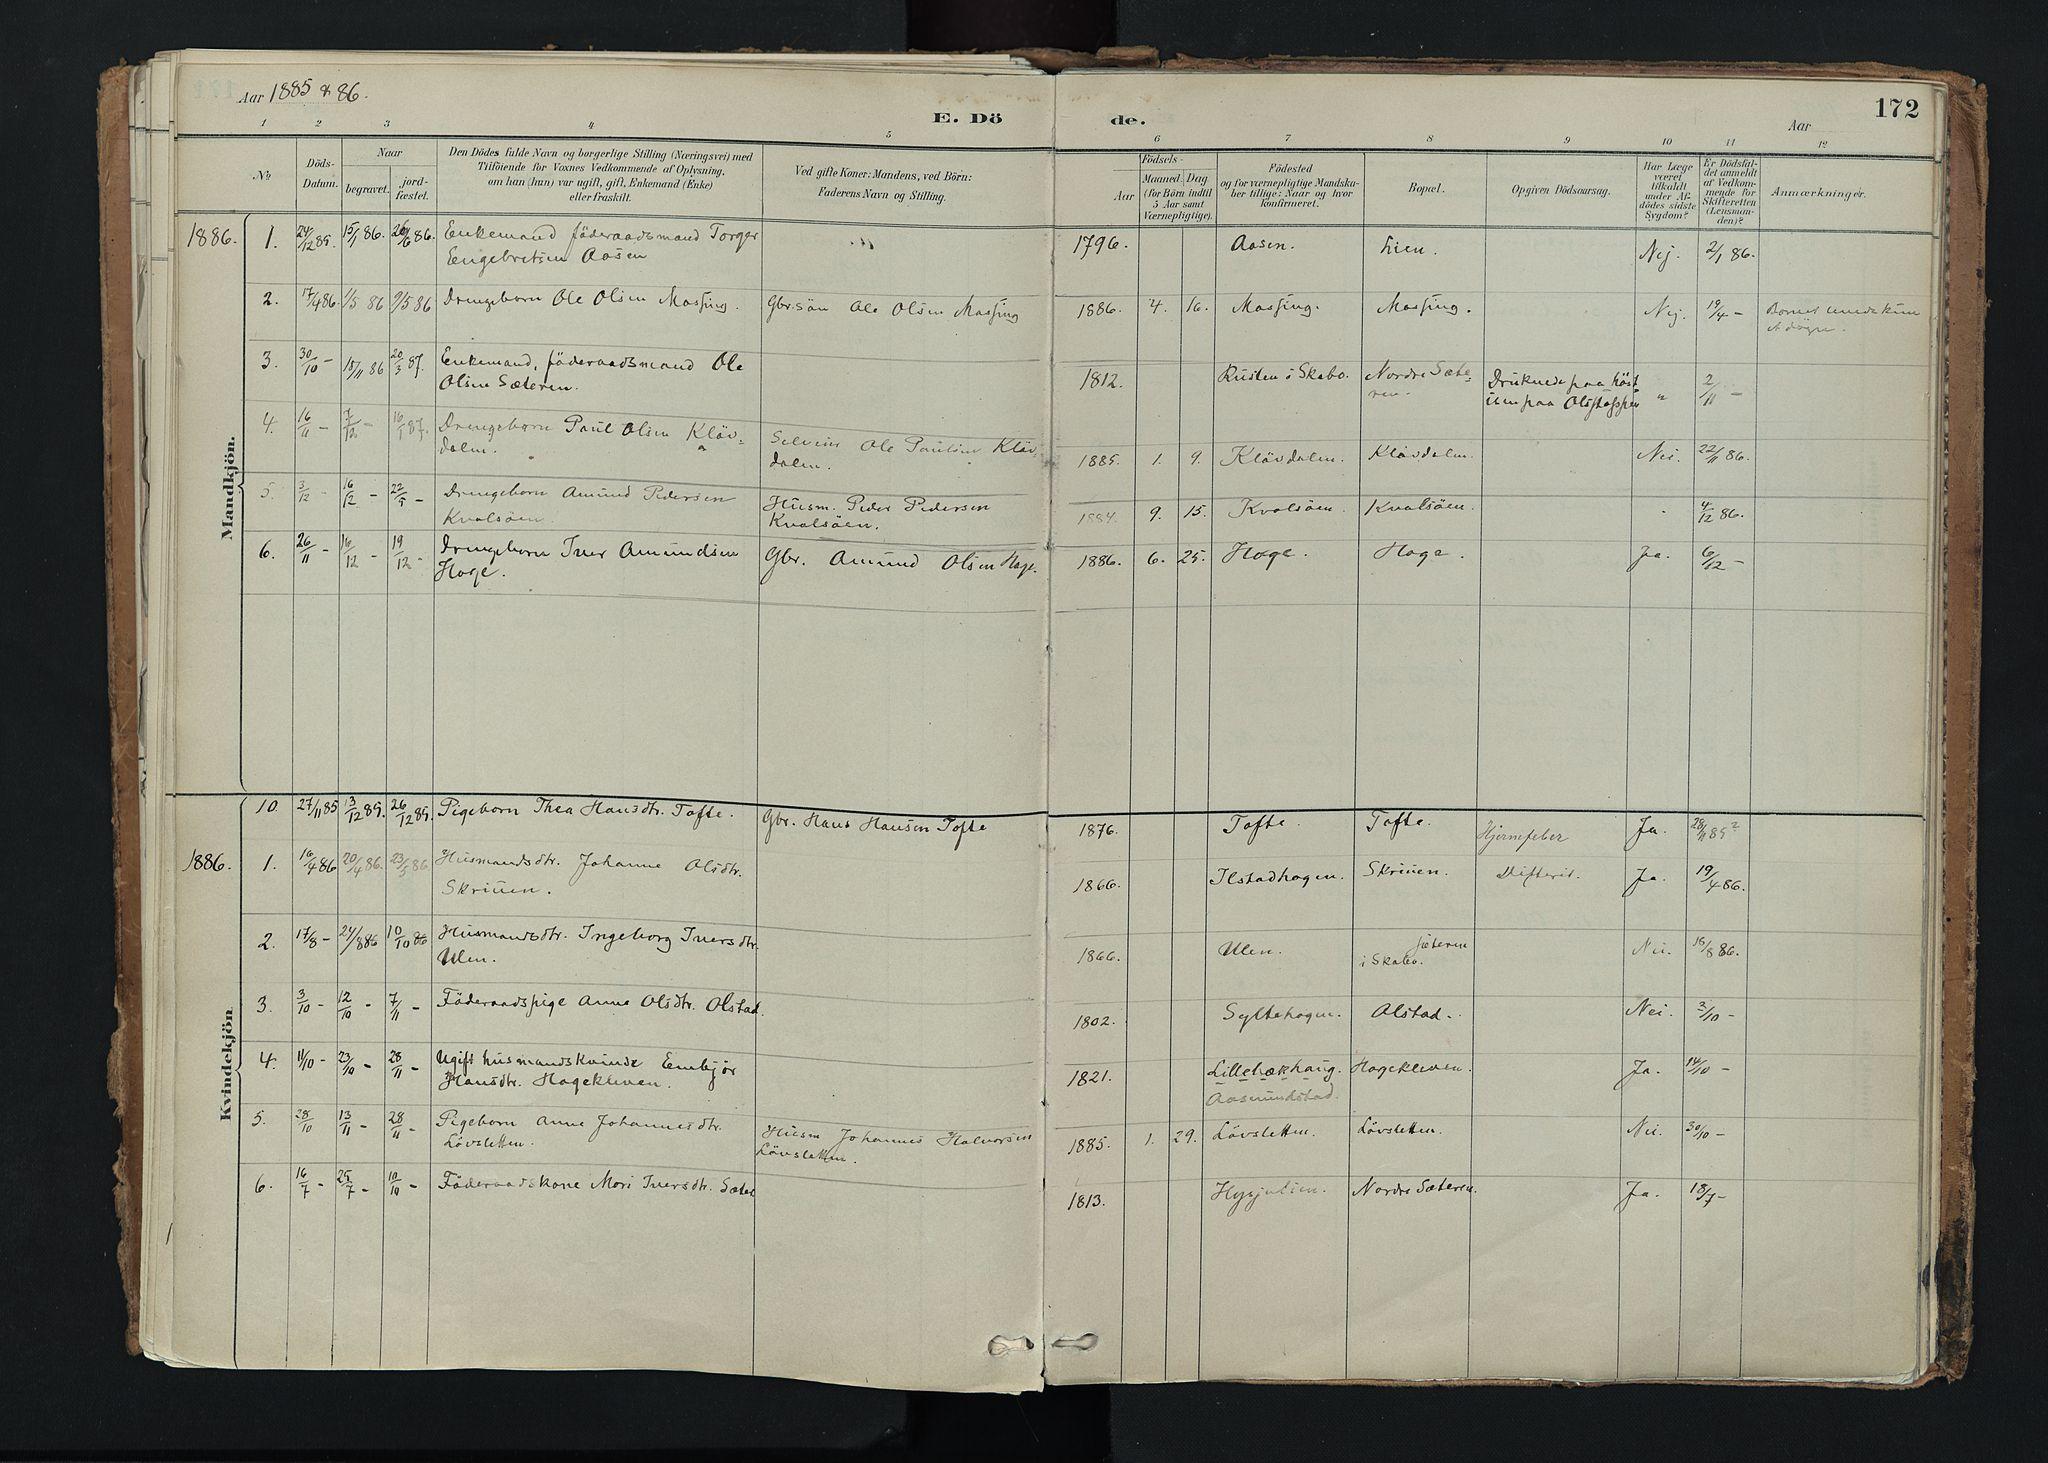 SAH, Nord-Fron prestekontor, Ministerialbok nr. 5, 1884-1914, s. 172